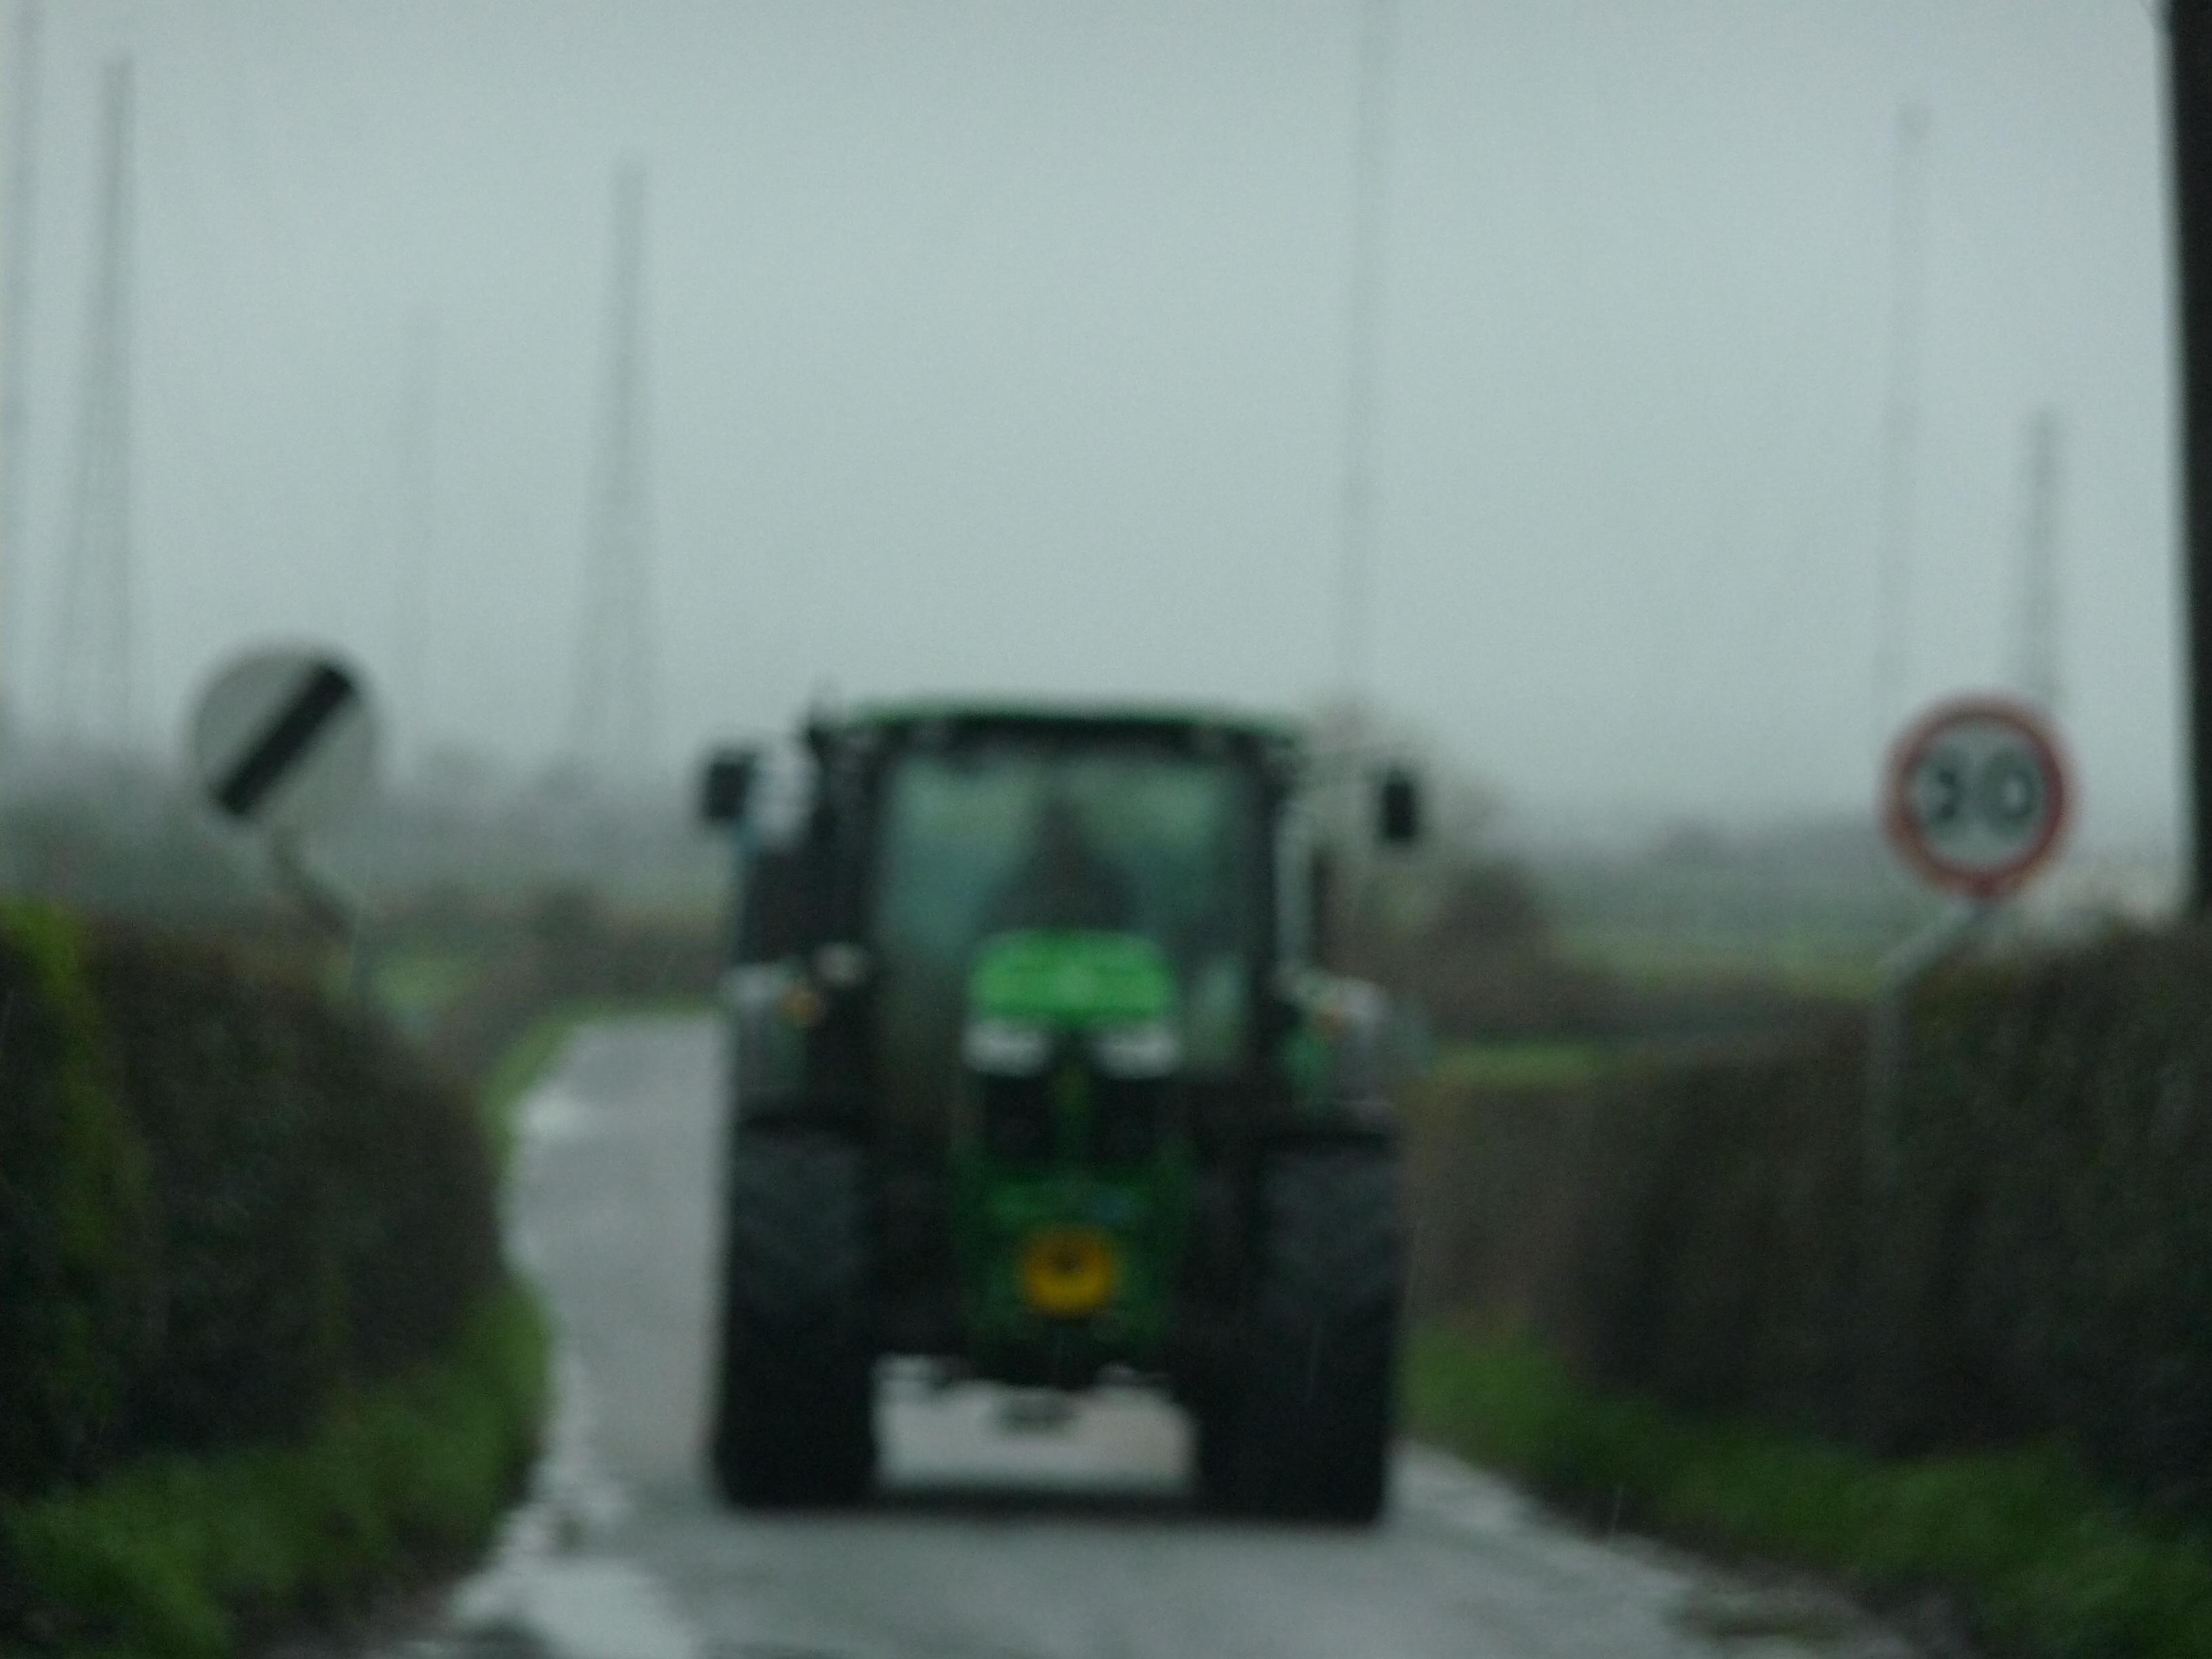 Tractor blocking road